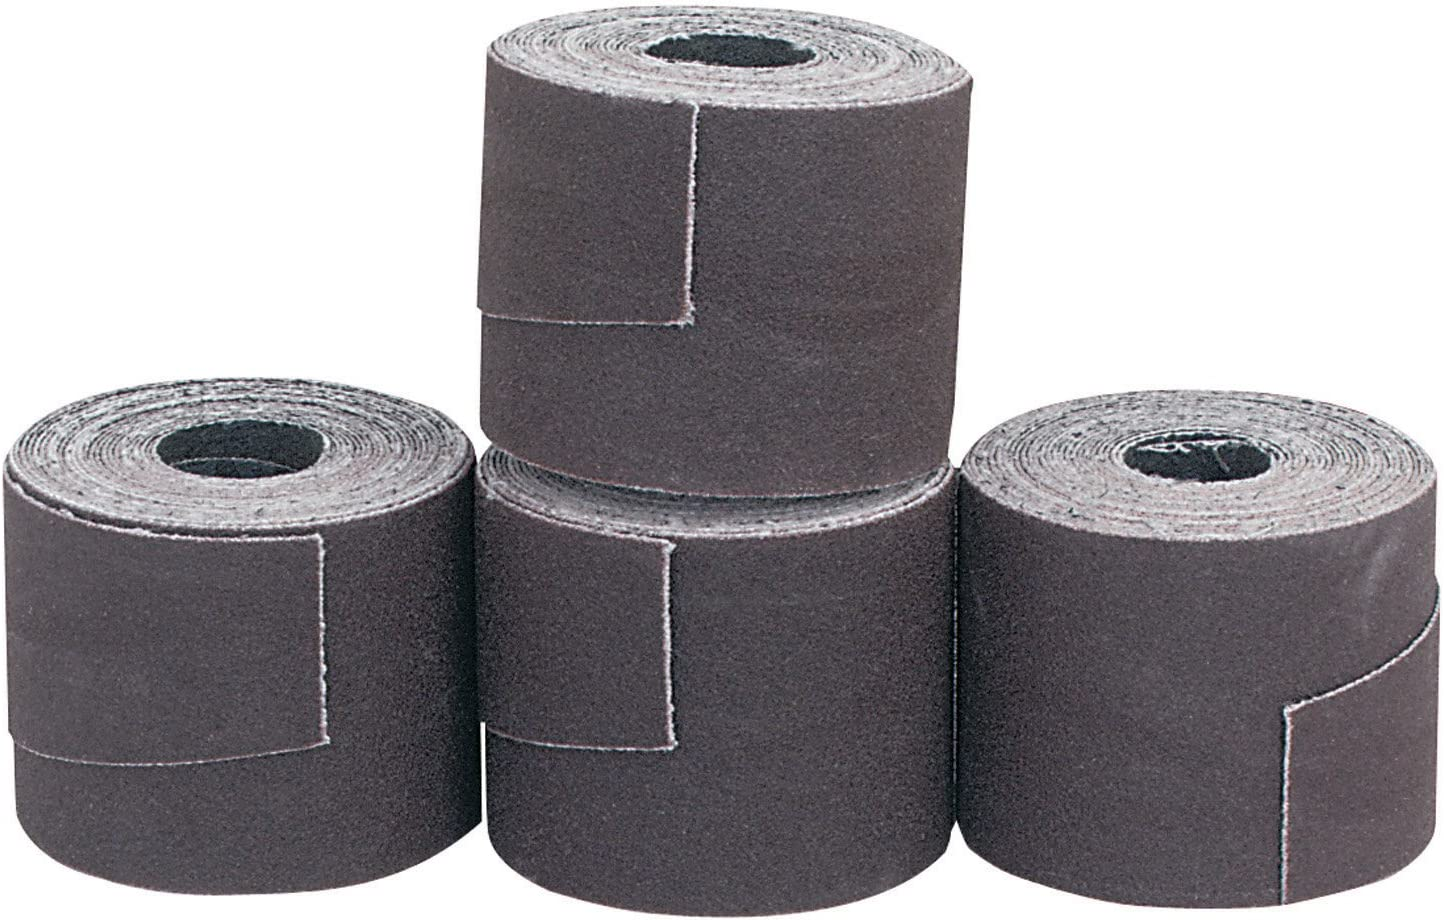 DELTA 31-817 80 Grit Pre-Cut Sanding Strips for Models 31-250, 31-255 Wide Drum Sanders